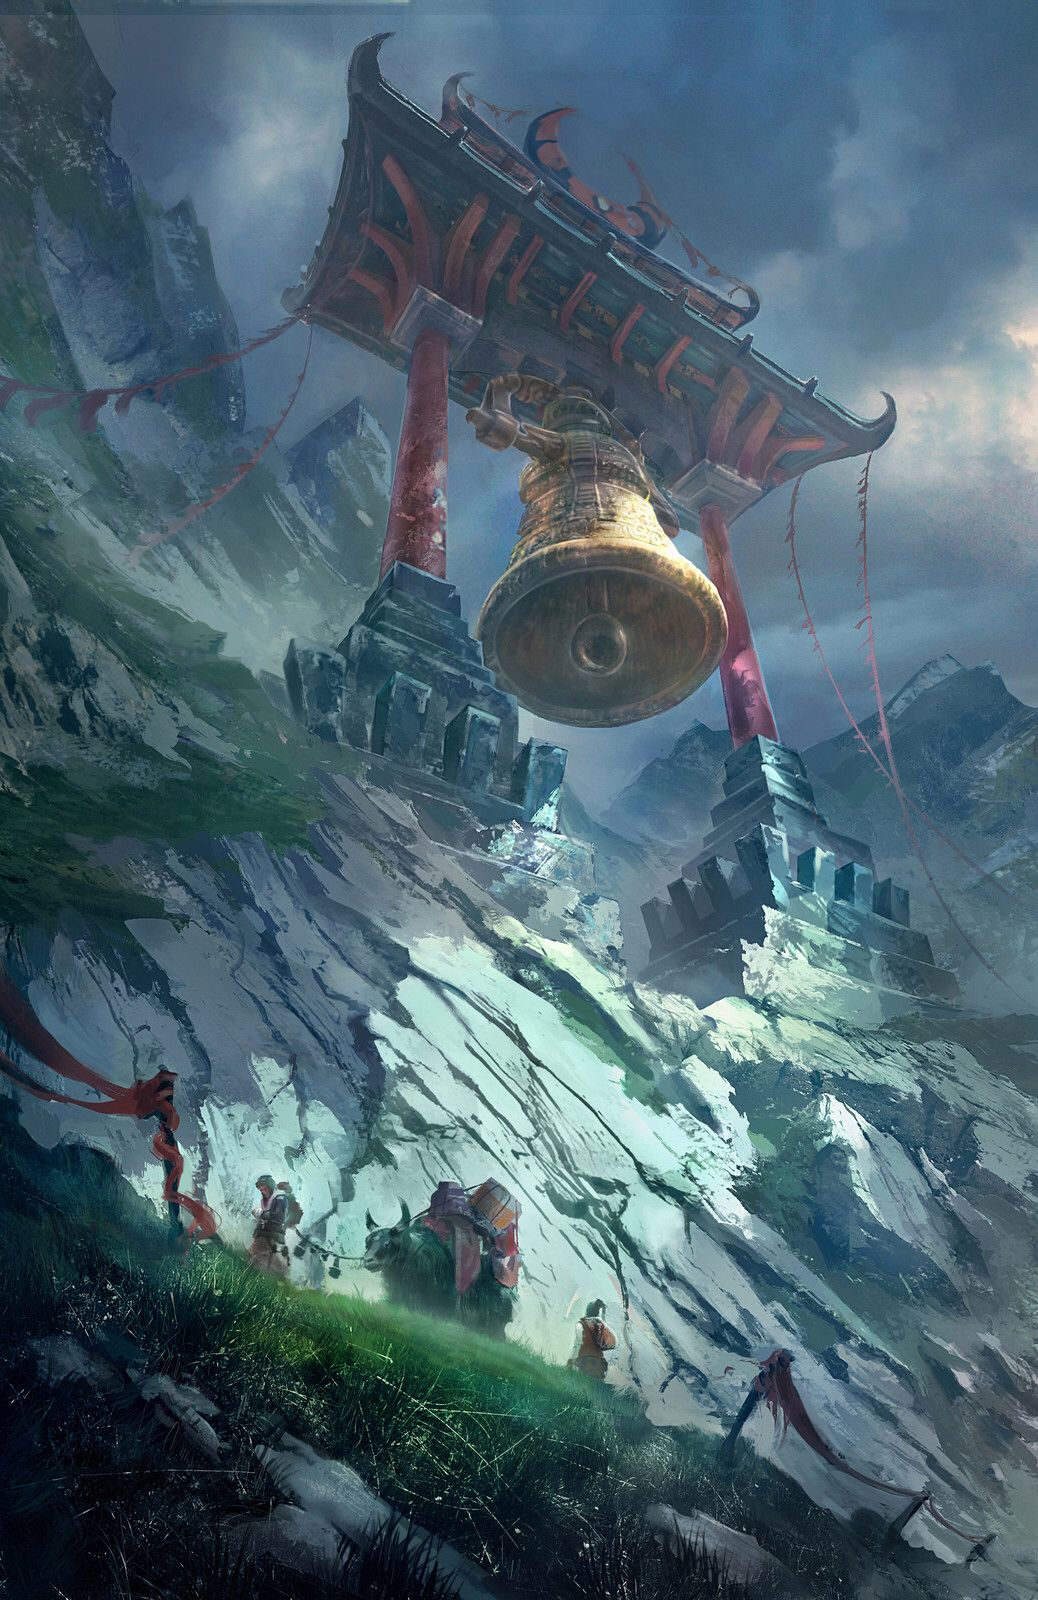 Pin van jeanne tims ross op art fantasy landscapes structures